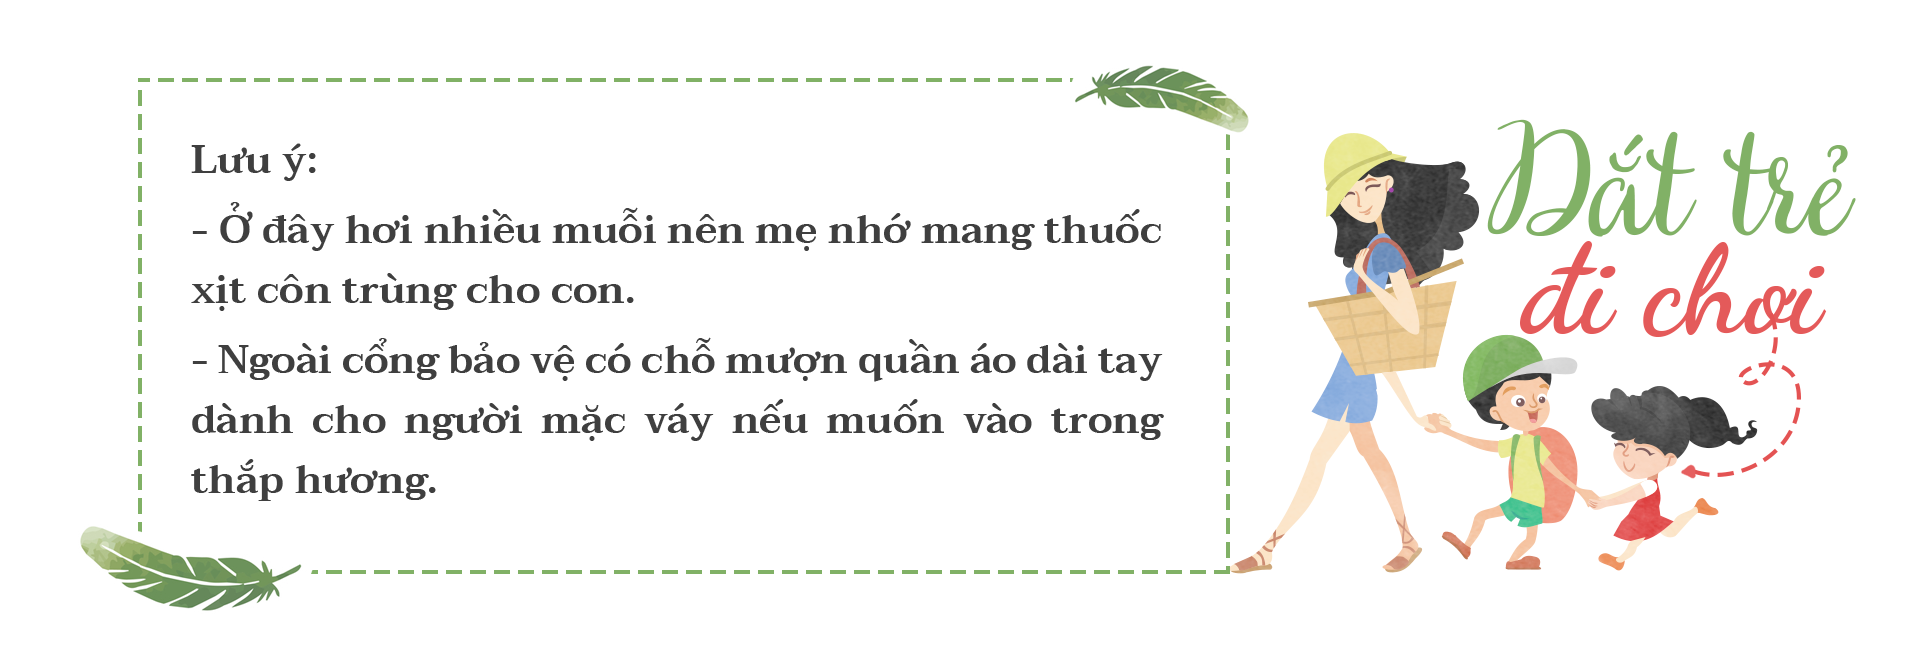 hay de tre con huong thu mot pho di bo hoan toan khac la - 9